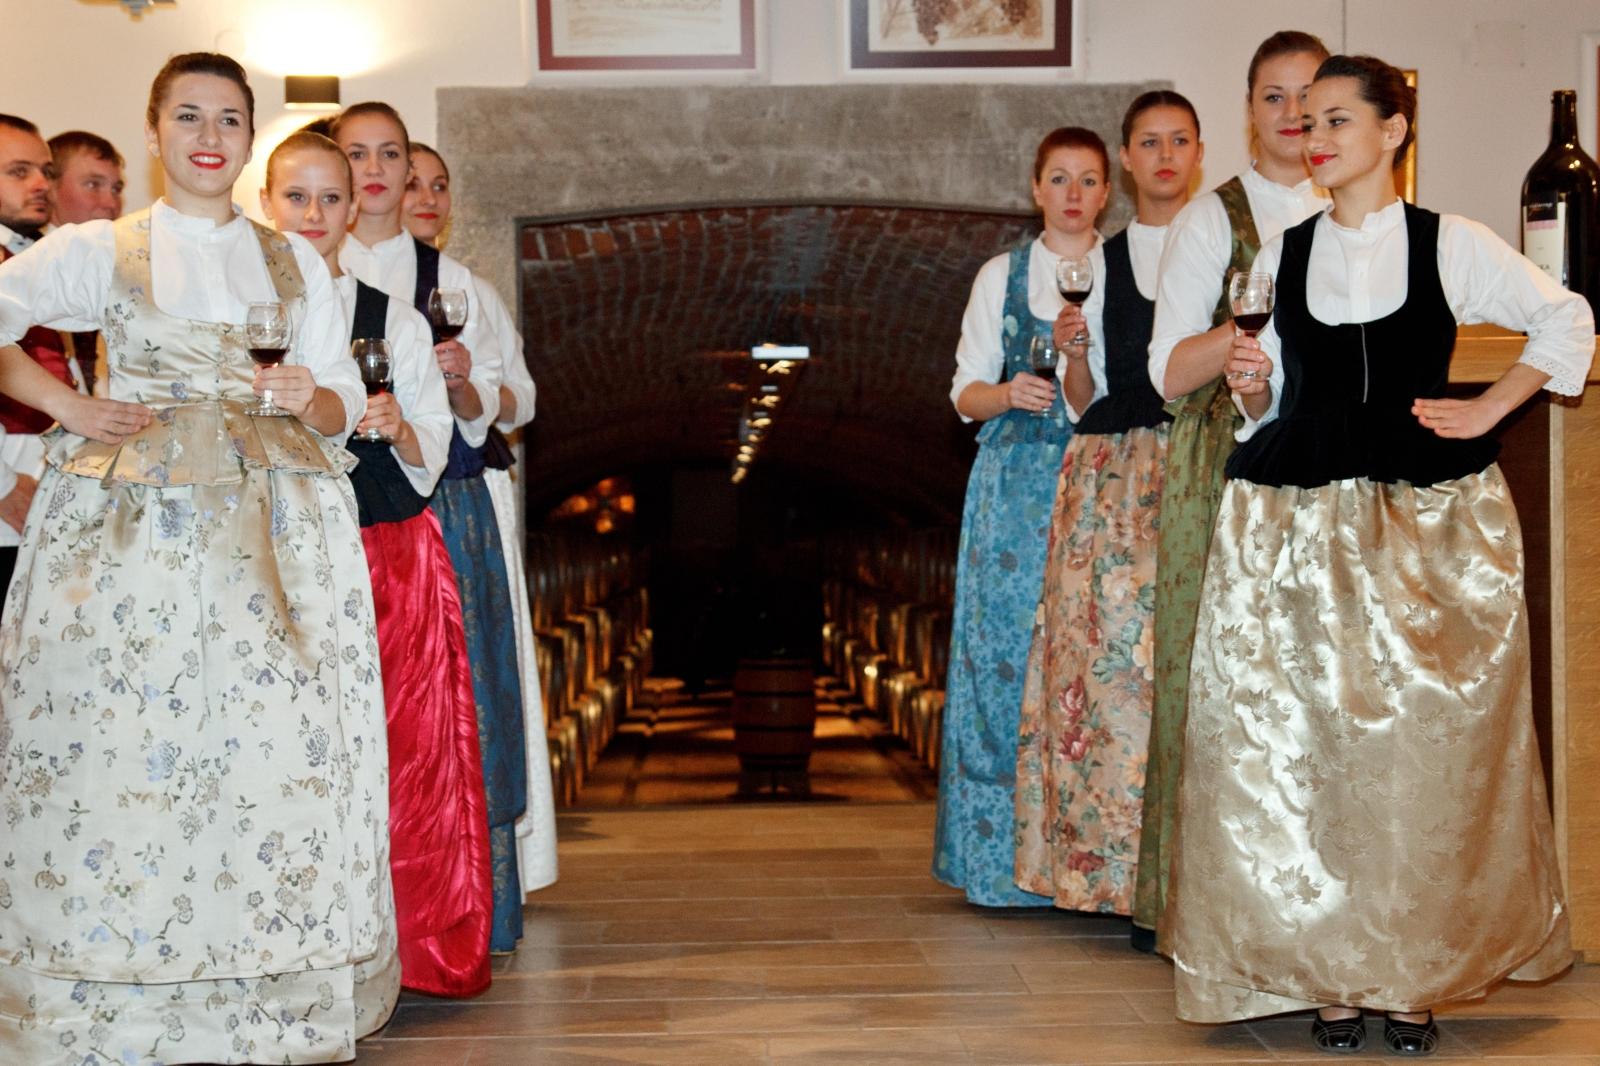 Slavonija: Feravino i ekskluzivni etno program